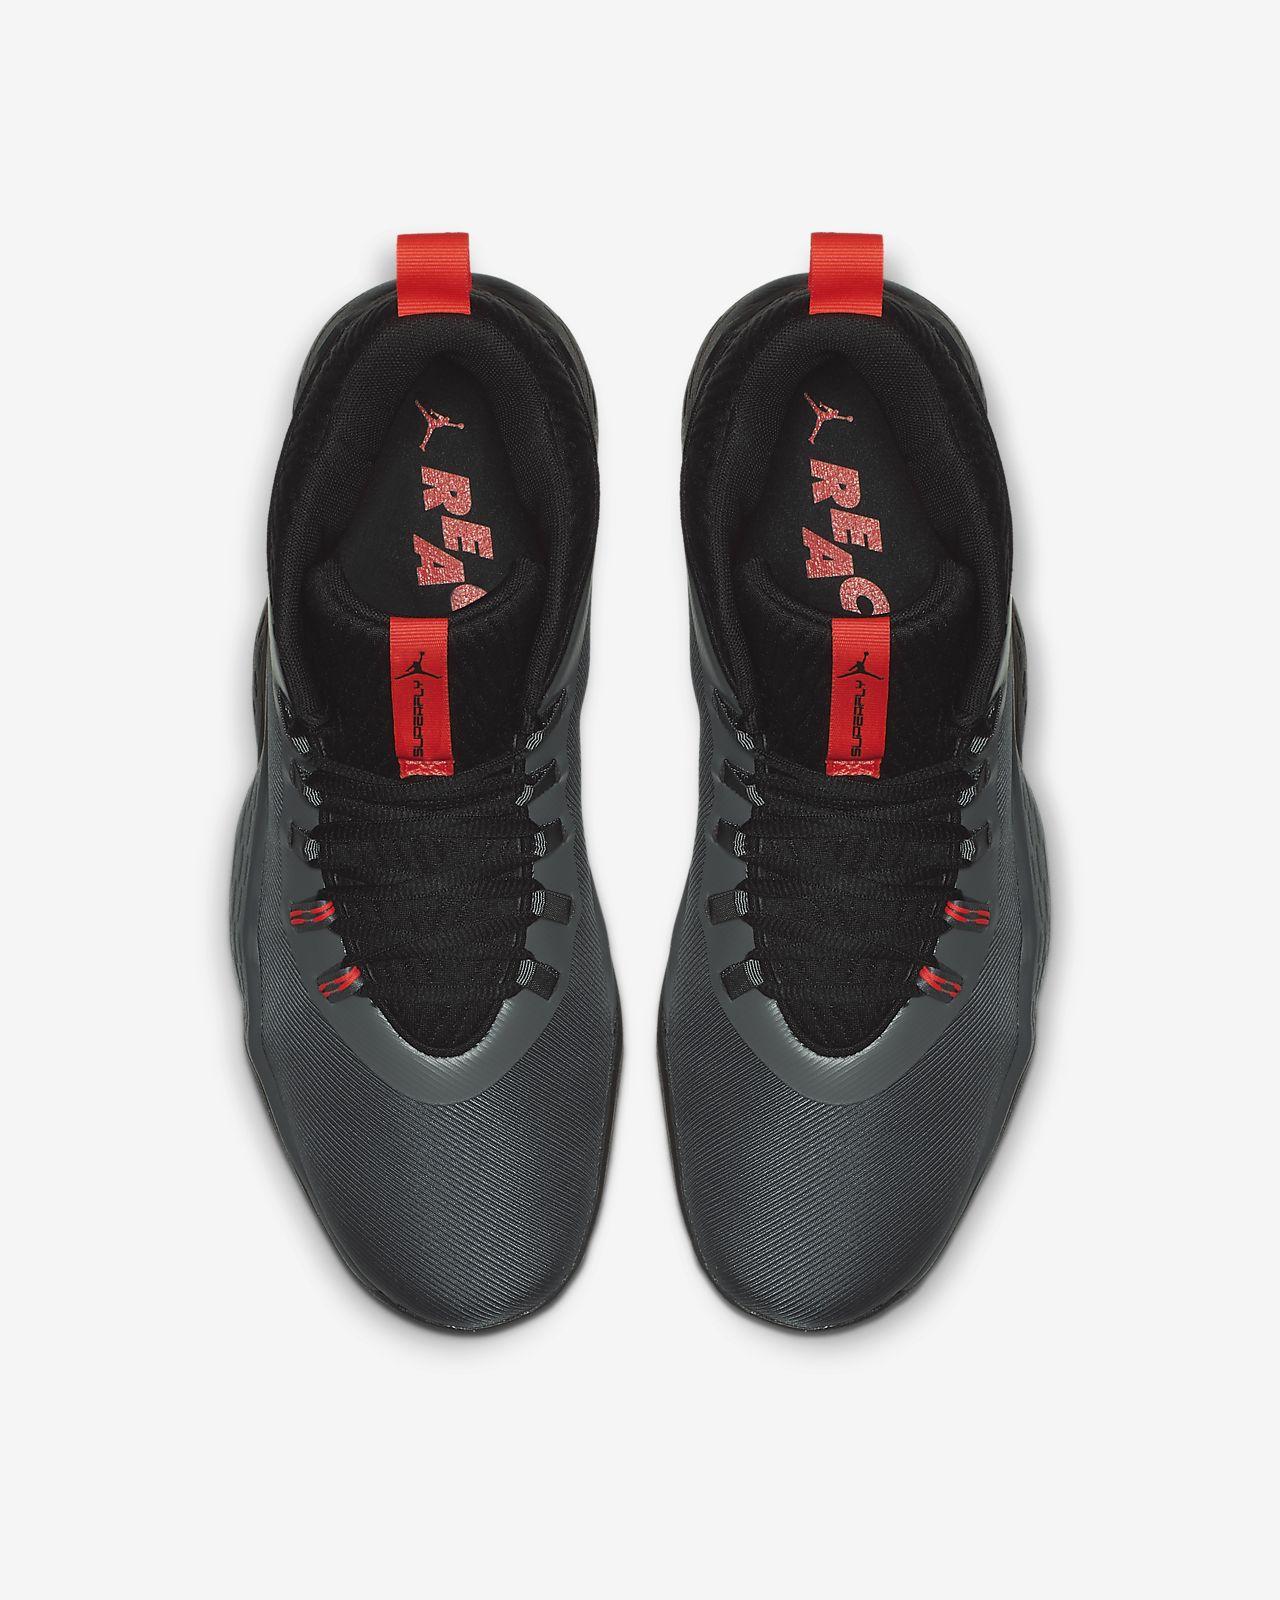 promo code fa5c0 66948 Fly MVP Low Men s Basketball Shoe Jordan Super.Fly MVP Low Men s Basketball  Shoe